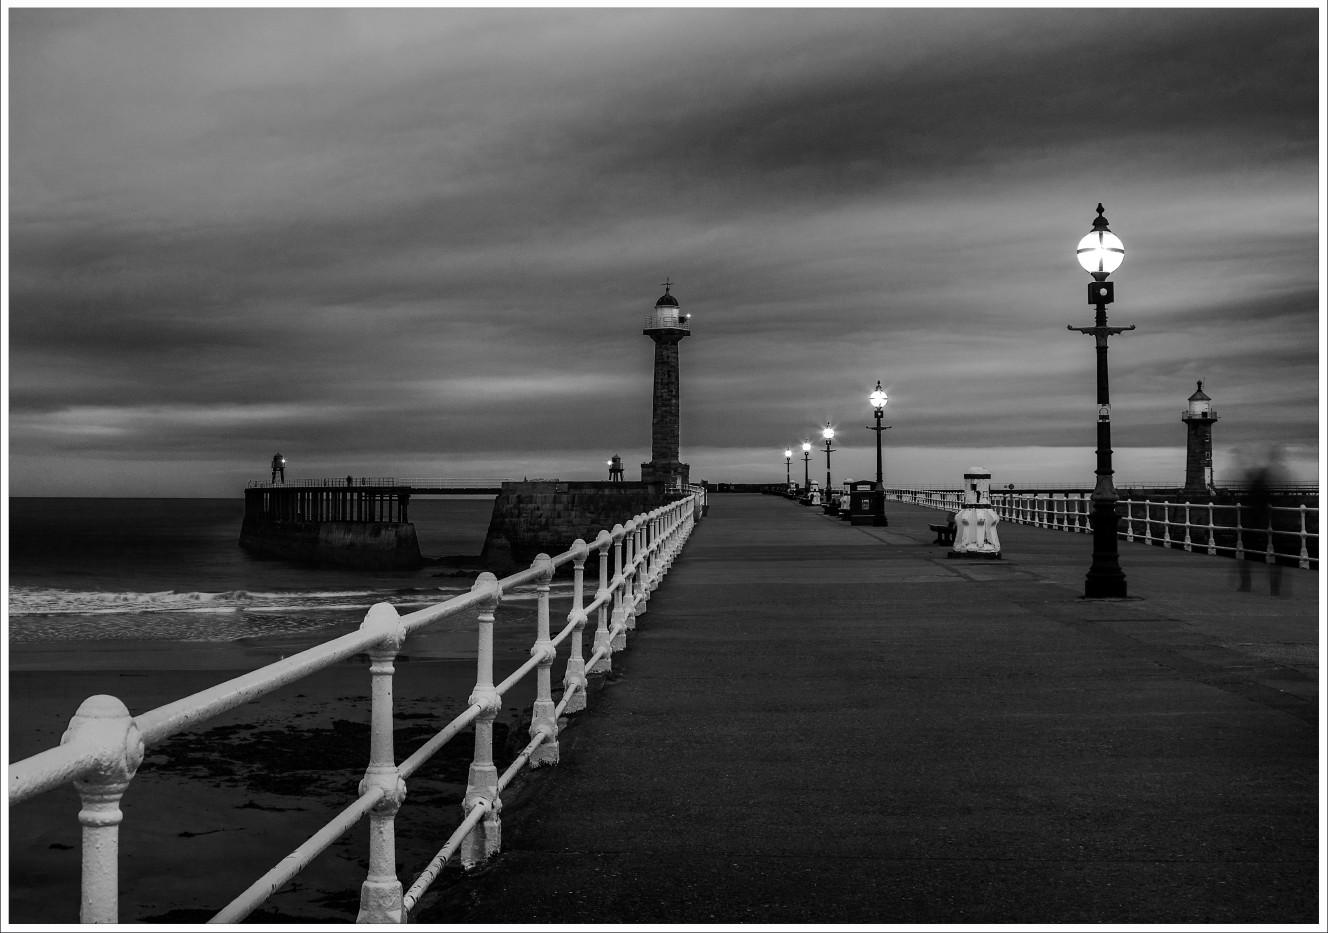 08 West pier lights.jpg